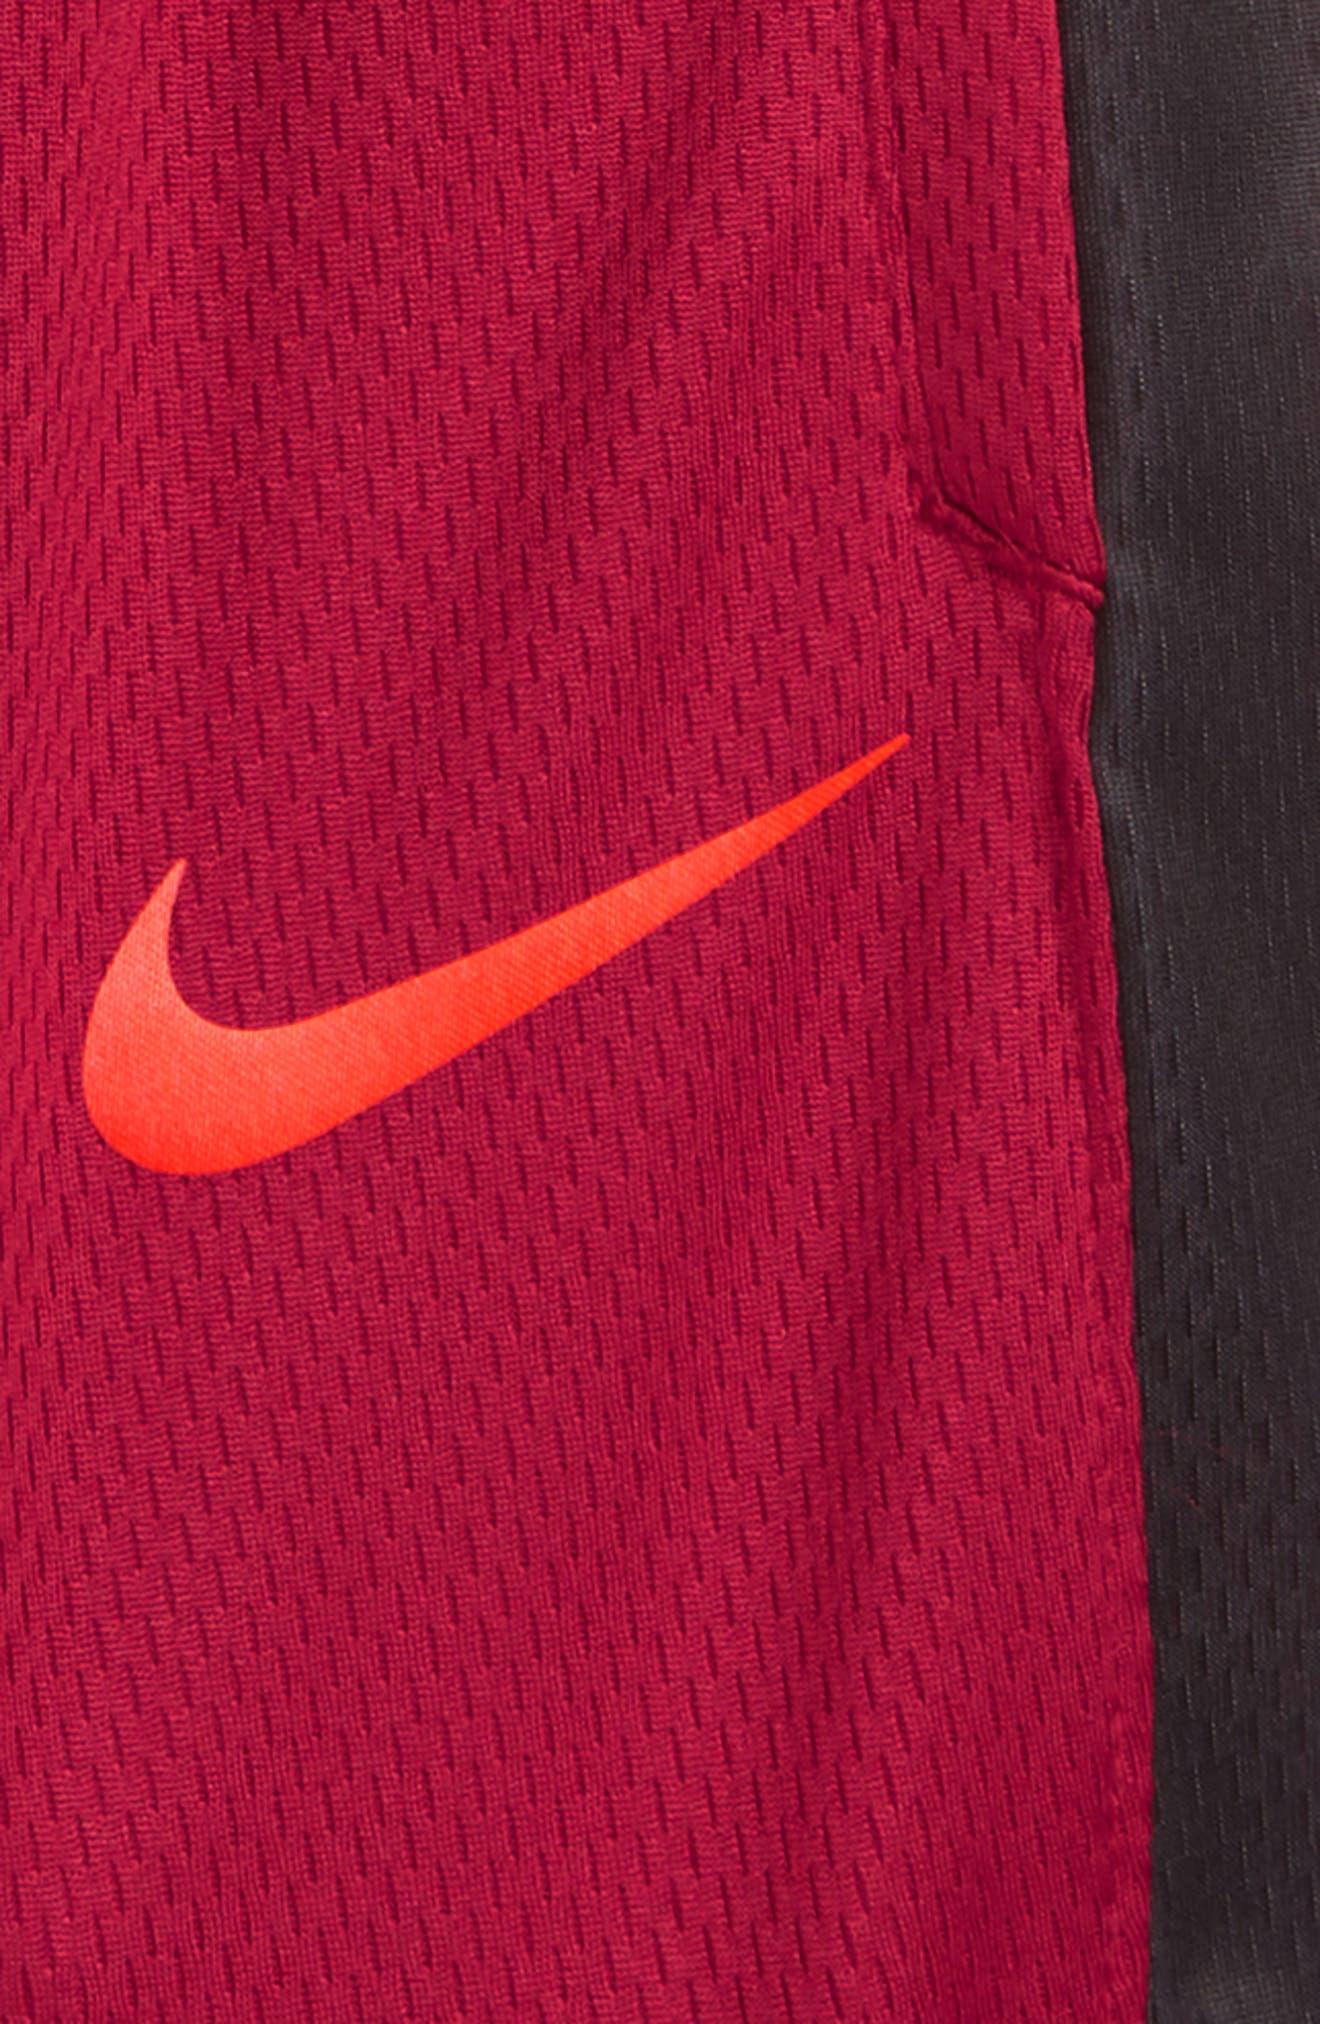 Elite Stripe Shorts,                             Alternate thumbnail 3, color,                             RED CRUSH